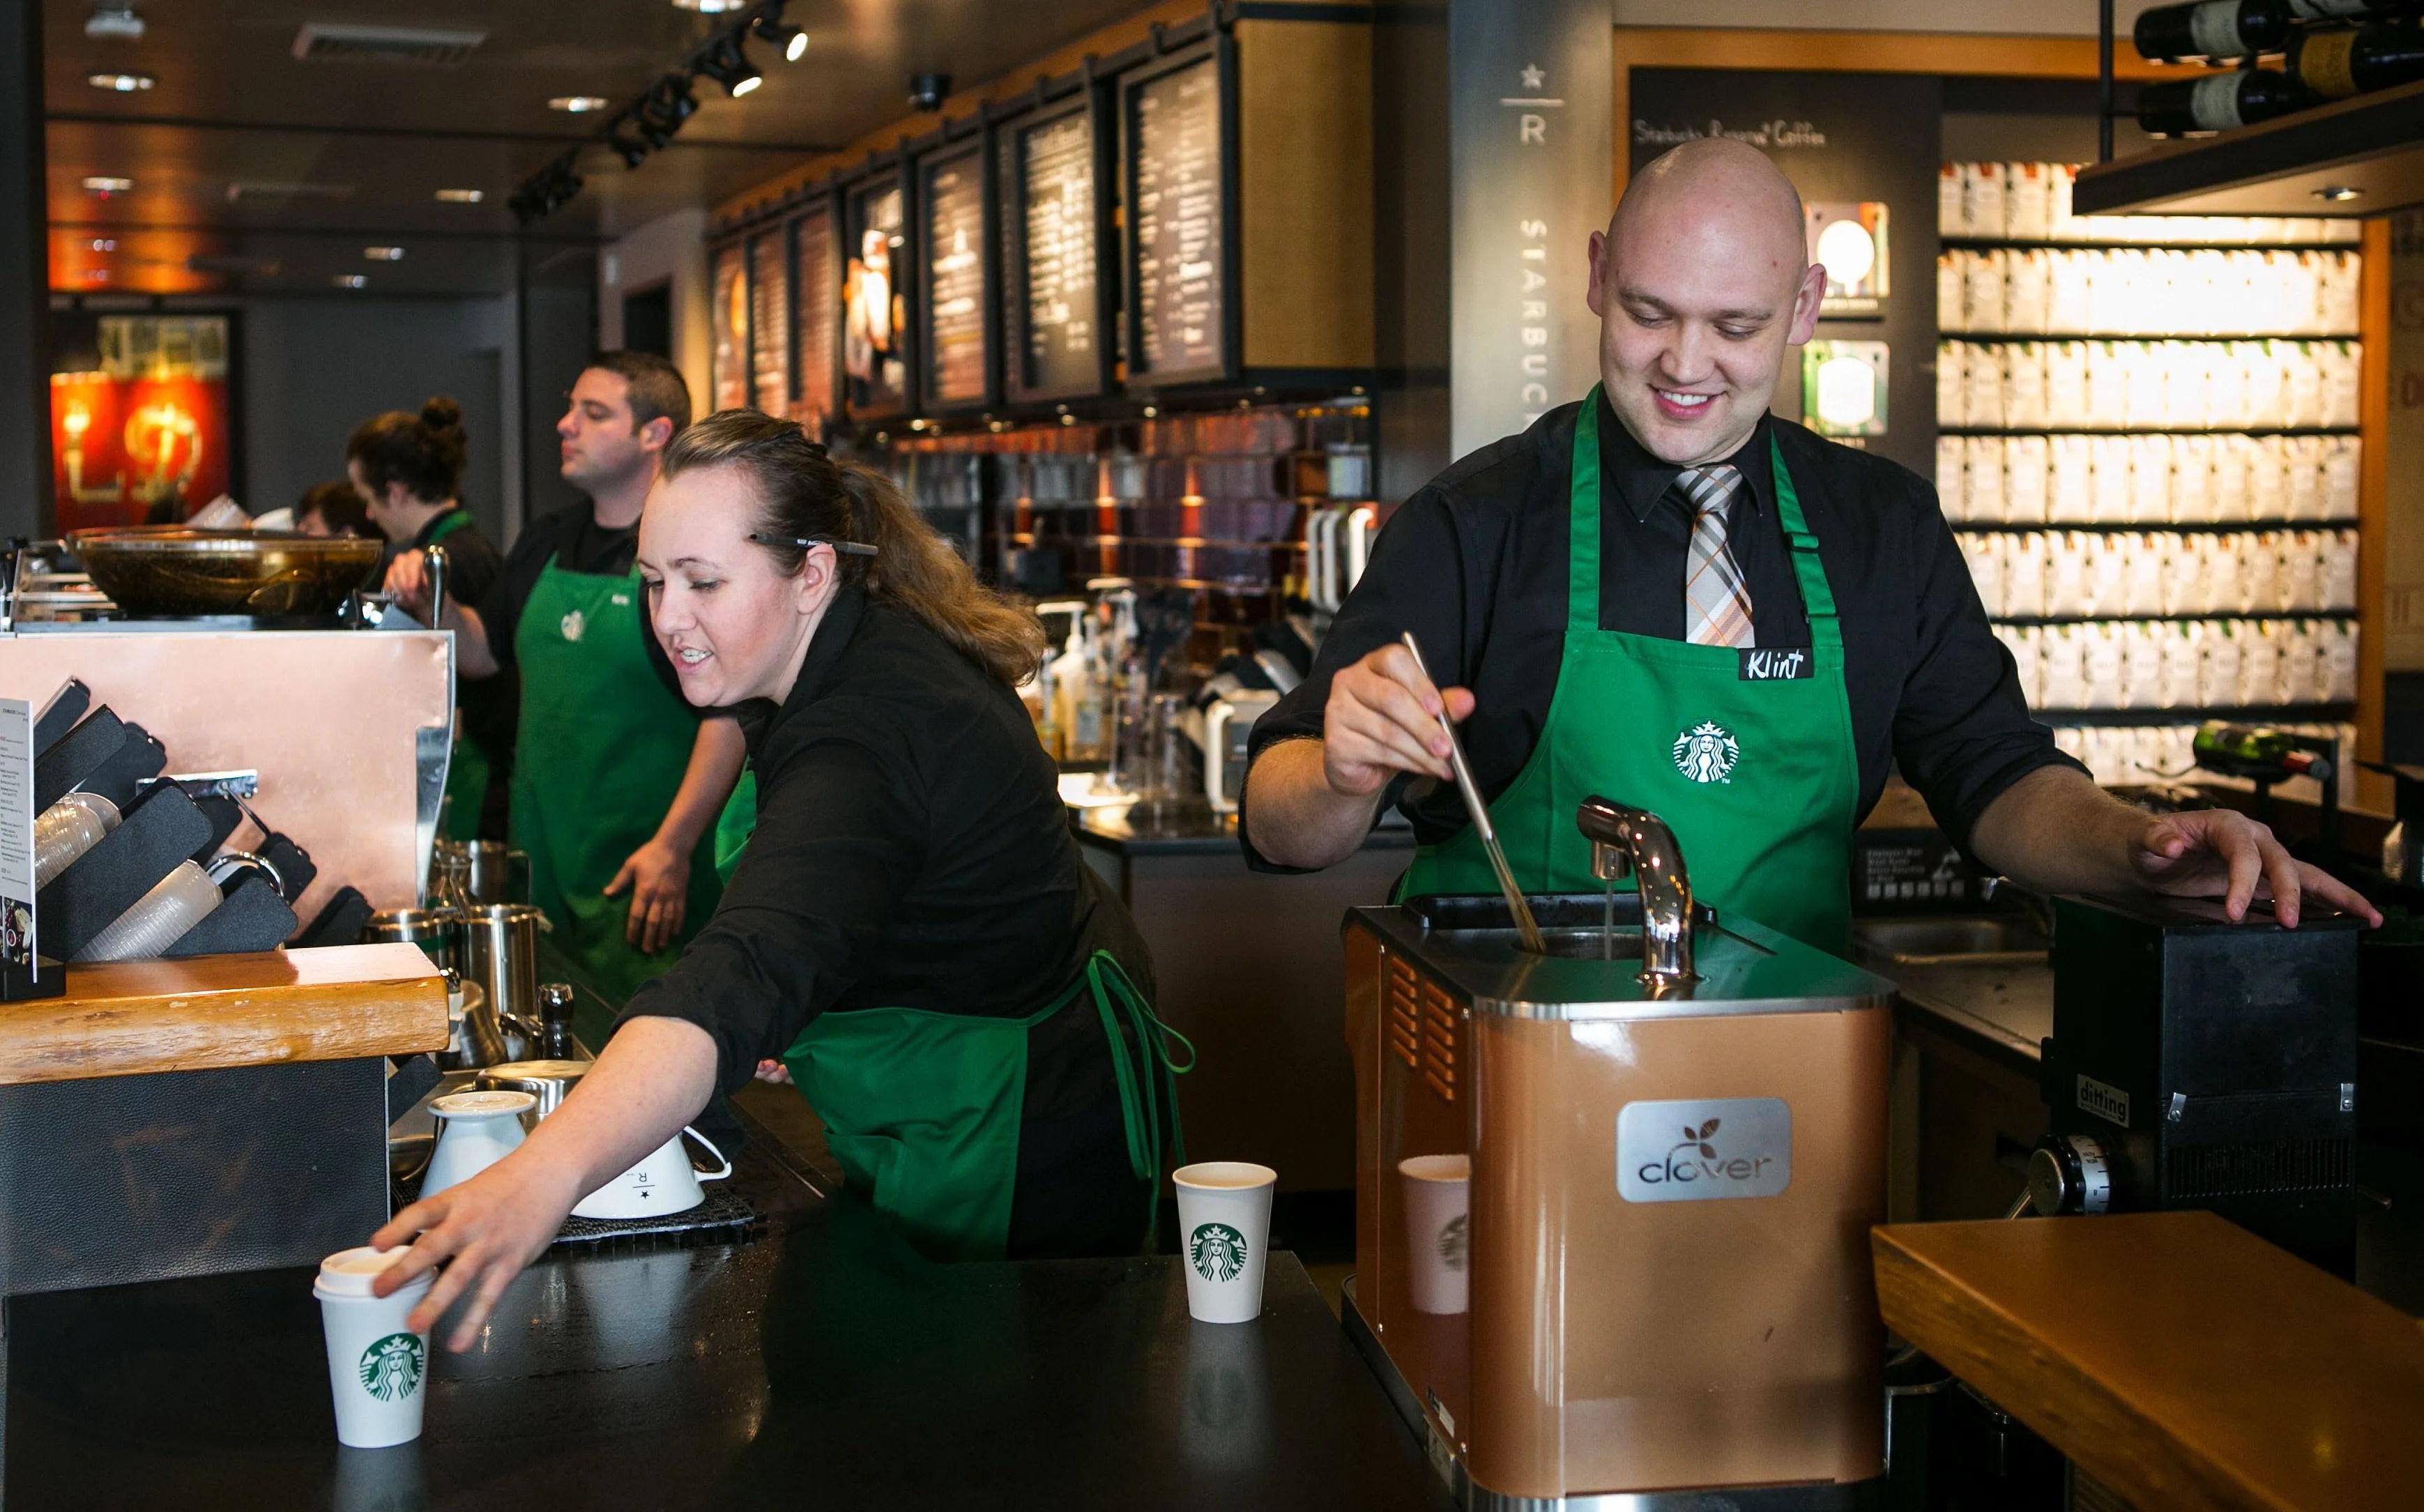 Starbucks\u0027 new drinks, eats, tech lift profit The Seattle Times